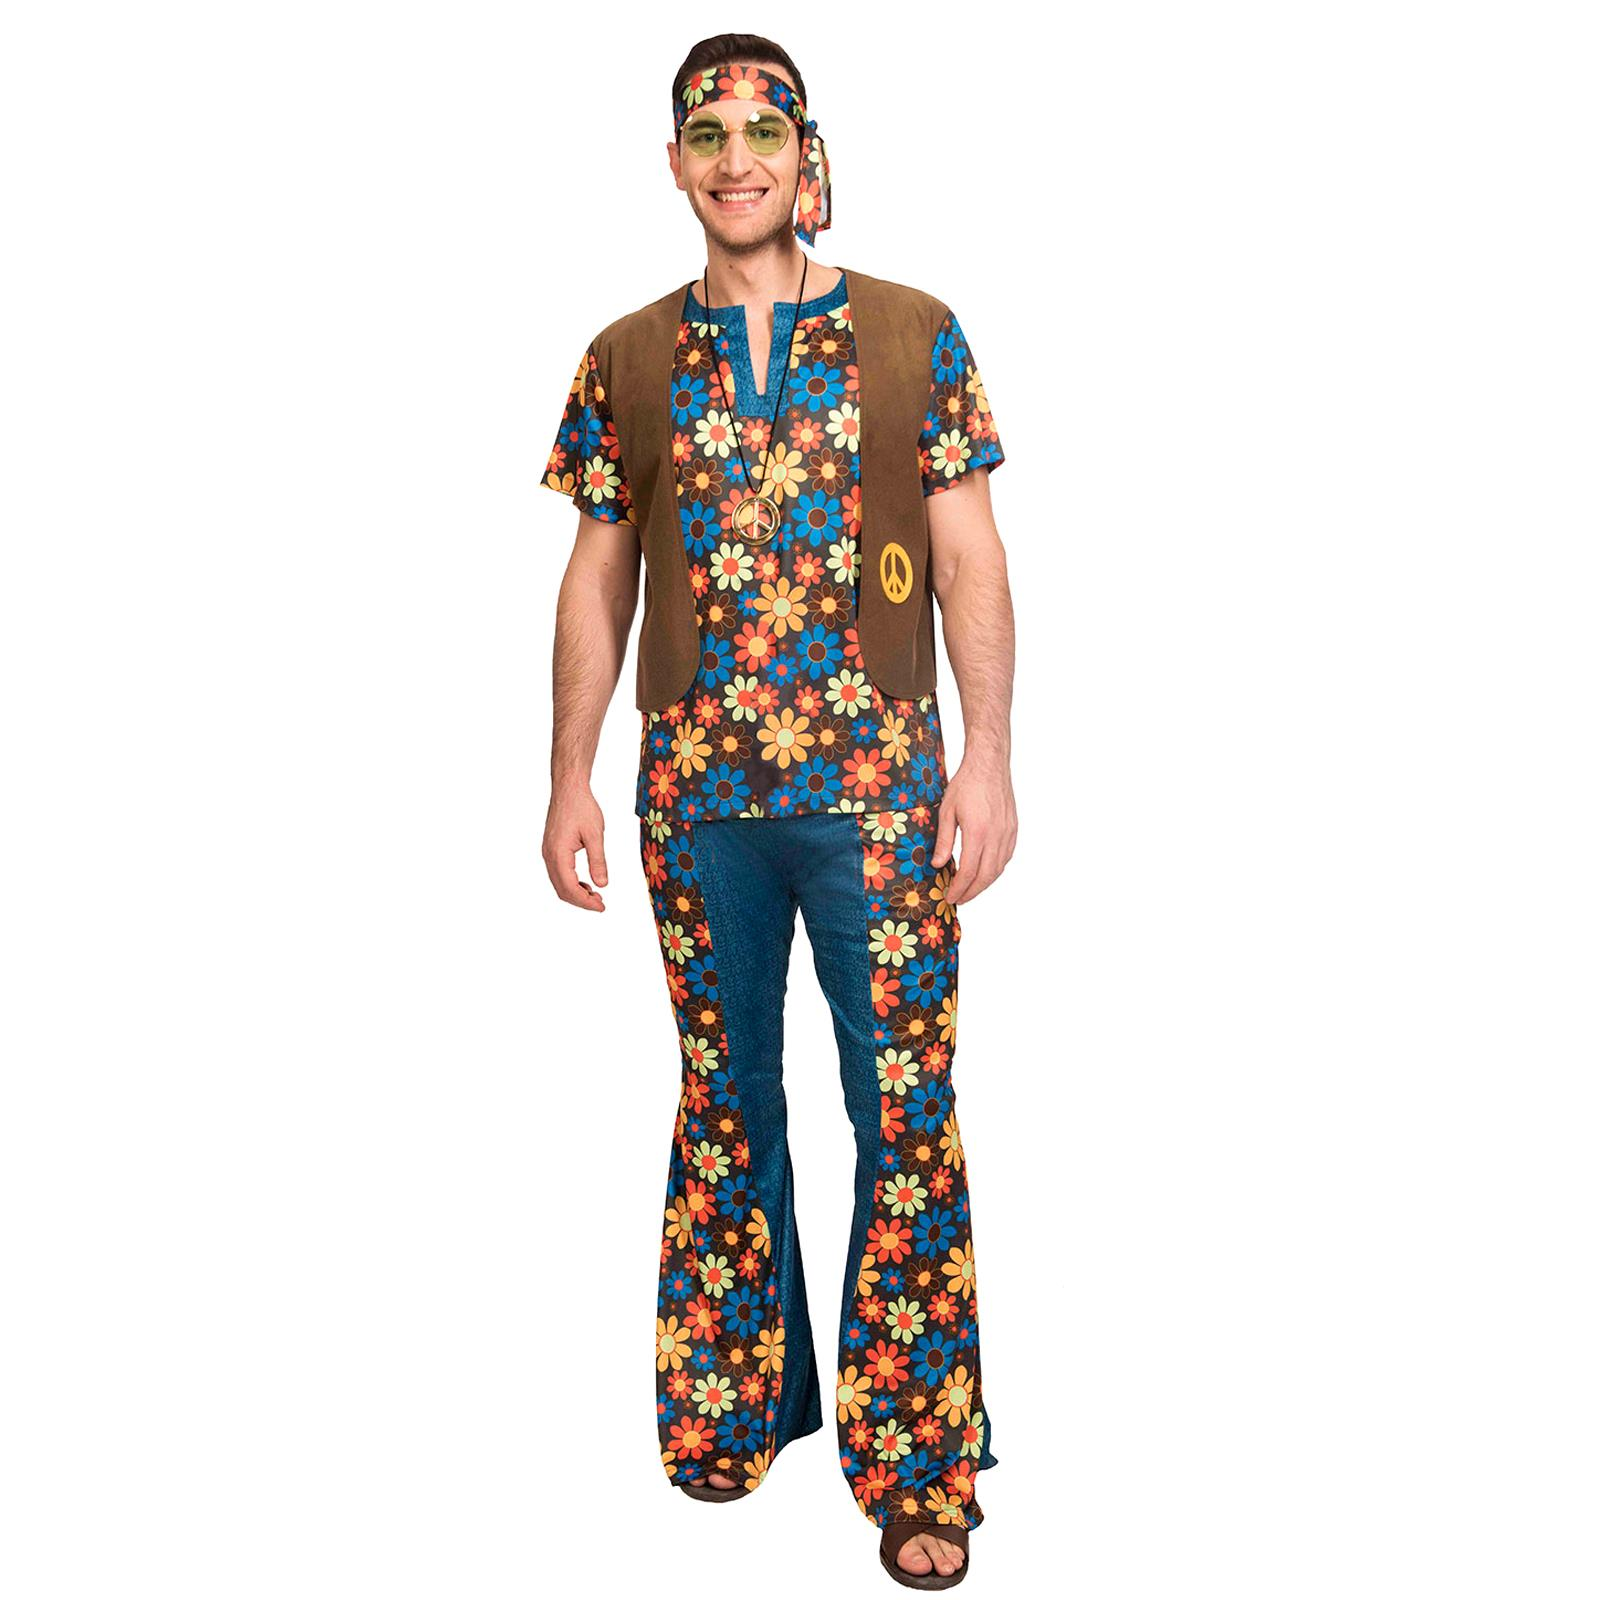 Marrone Hippie Parrucca donna Costume 60s 70s Groovy Hippy Adulto Costume Accessorio